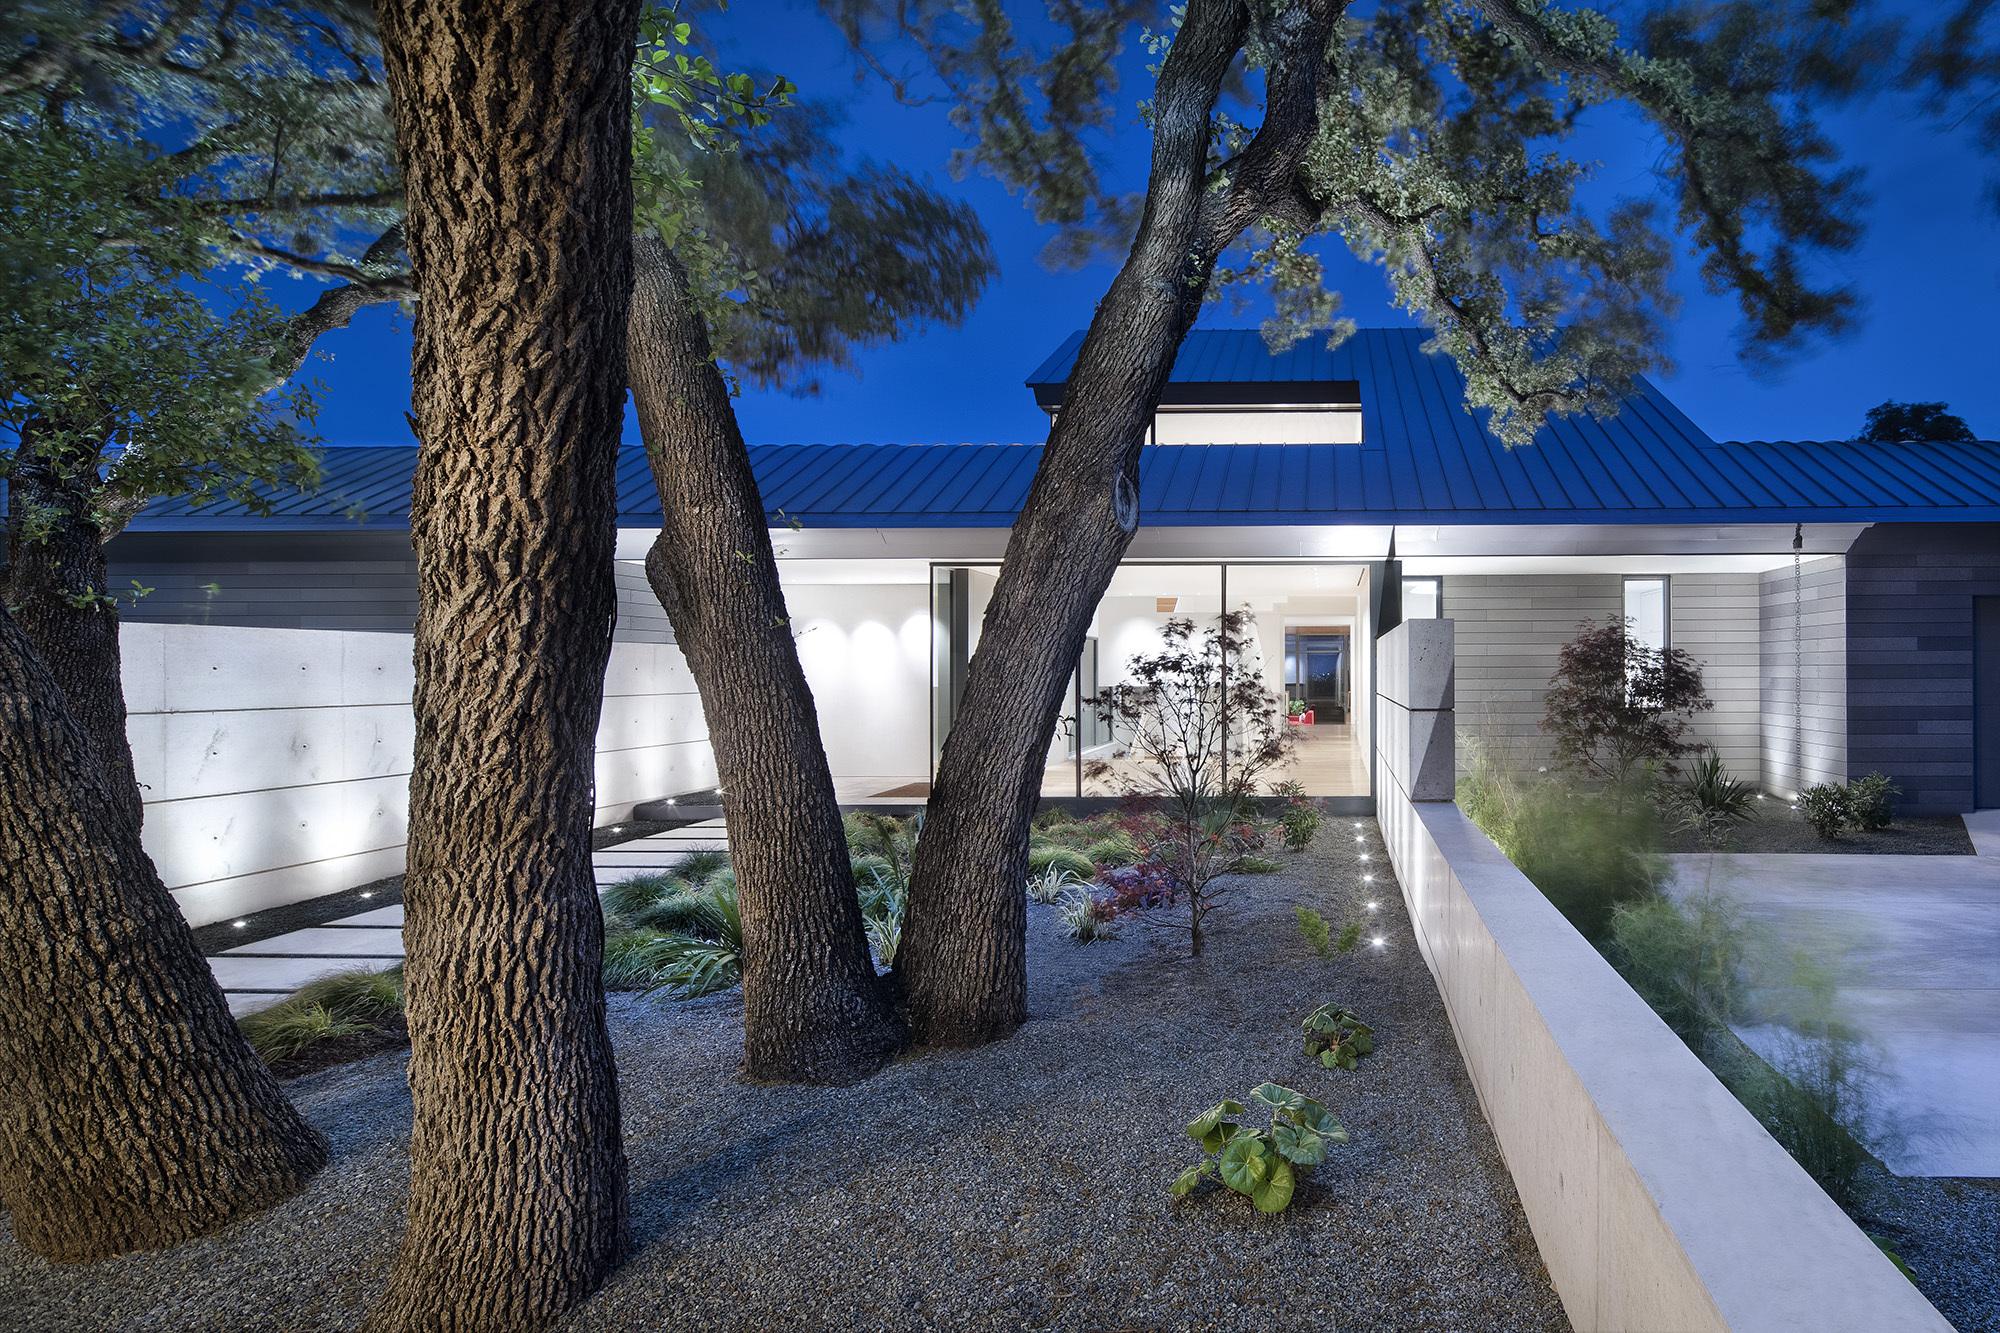 Vista Residence / Miró Rivera Architects